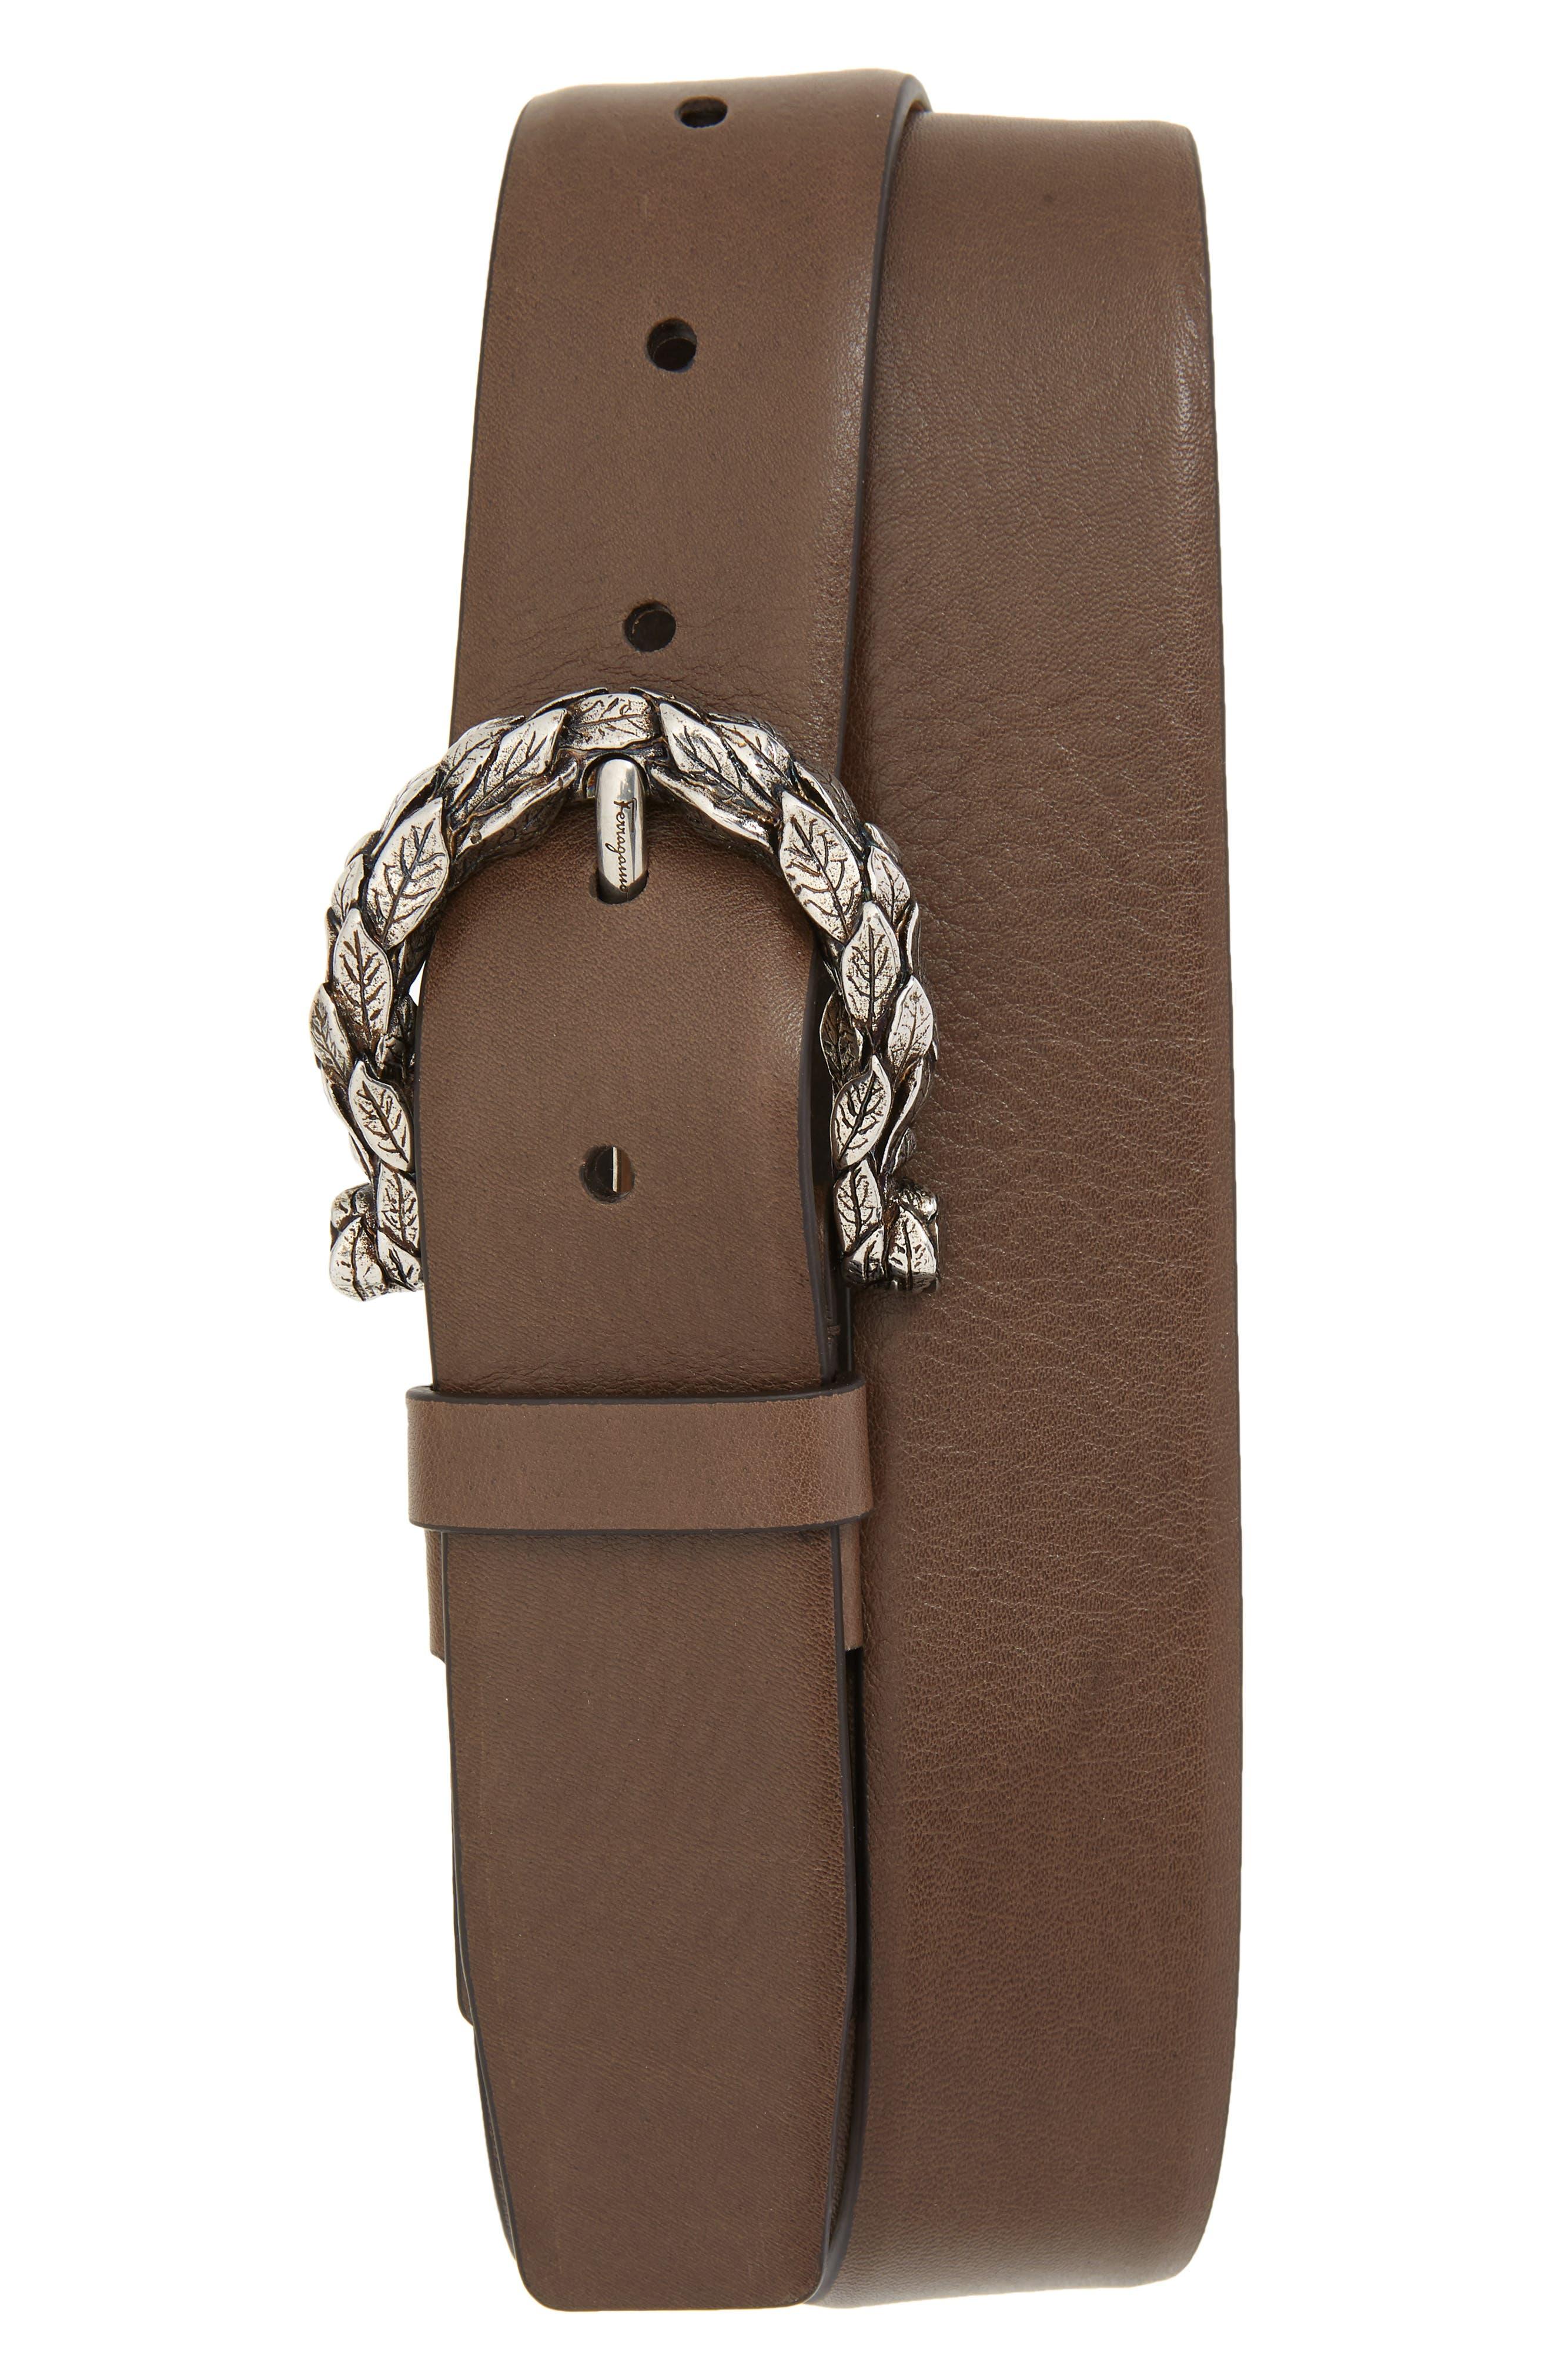 Alternate Image 1 Selected - Salvatore Ferragamo Gancio Leaf Buckle Leather Belt